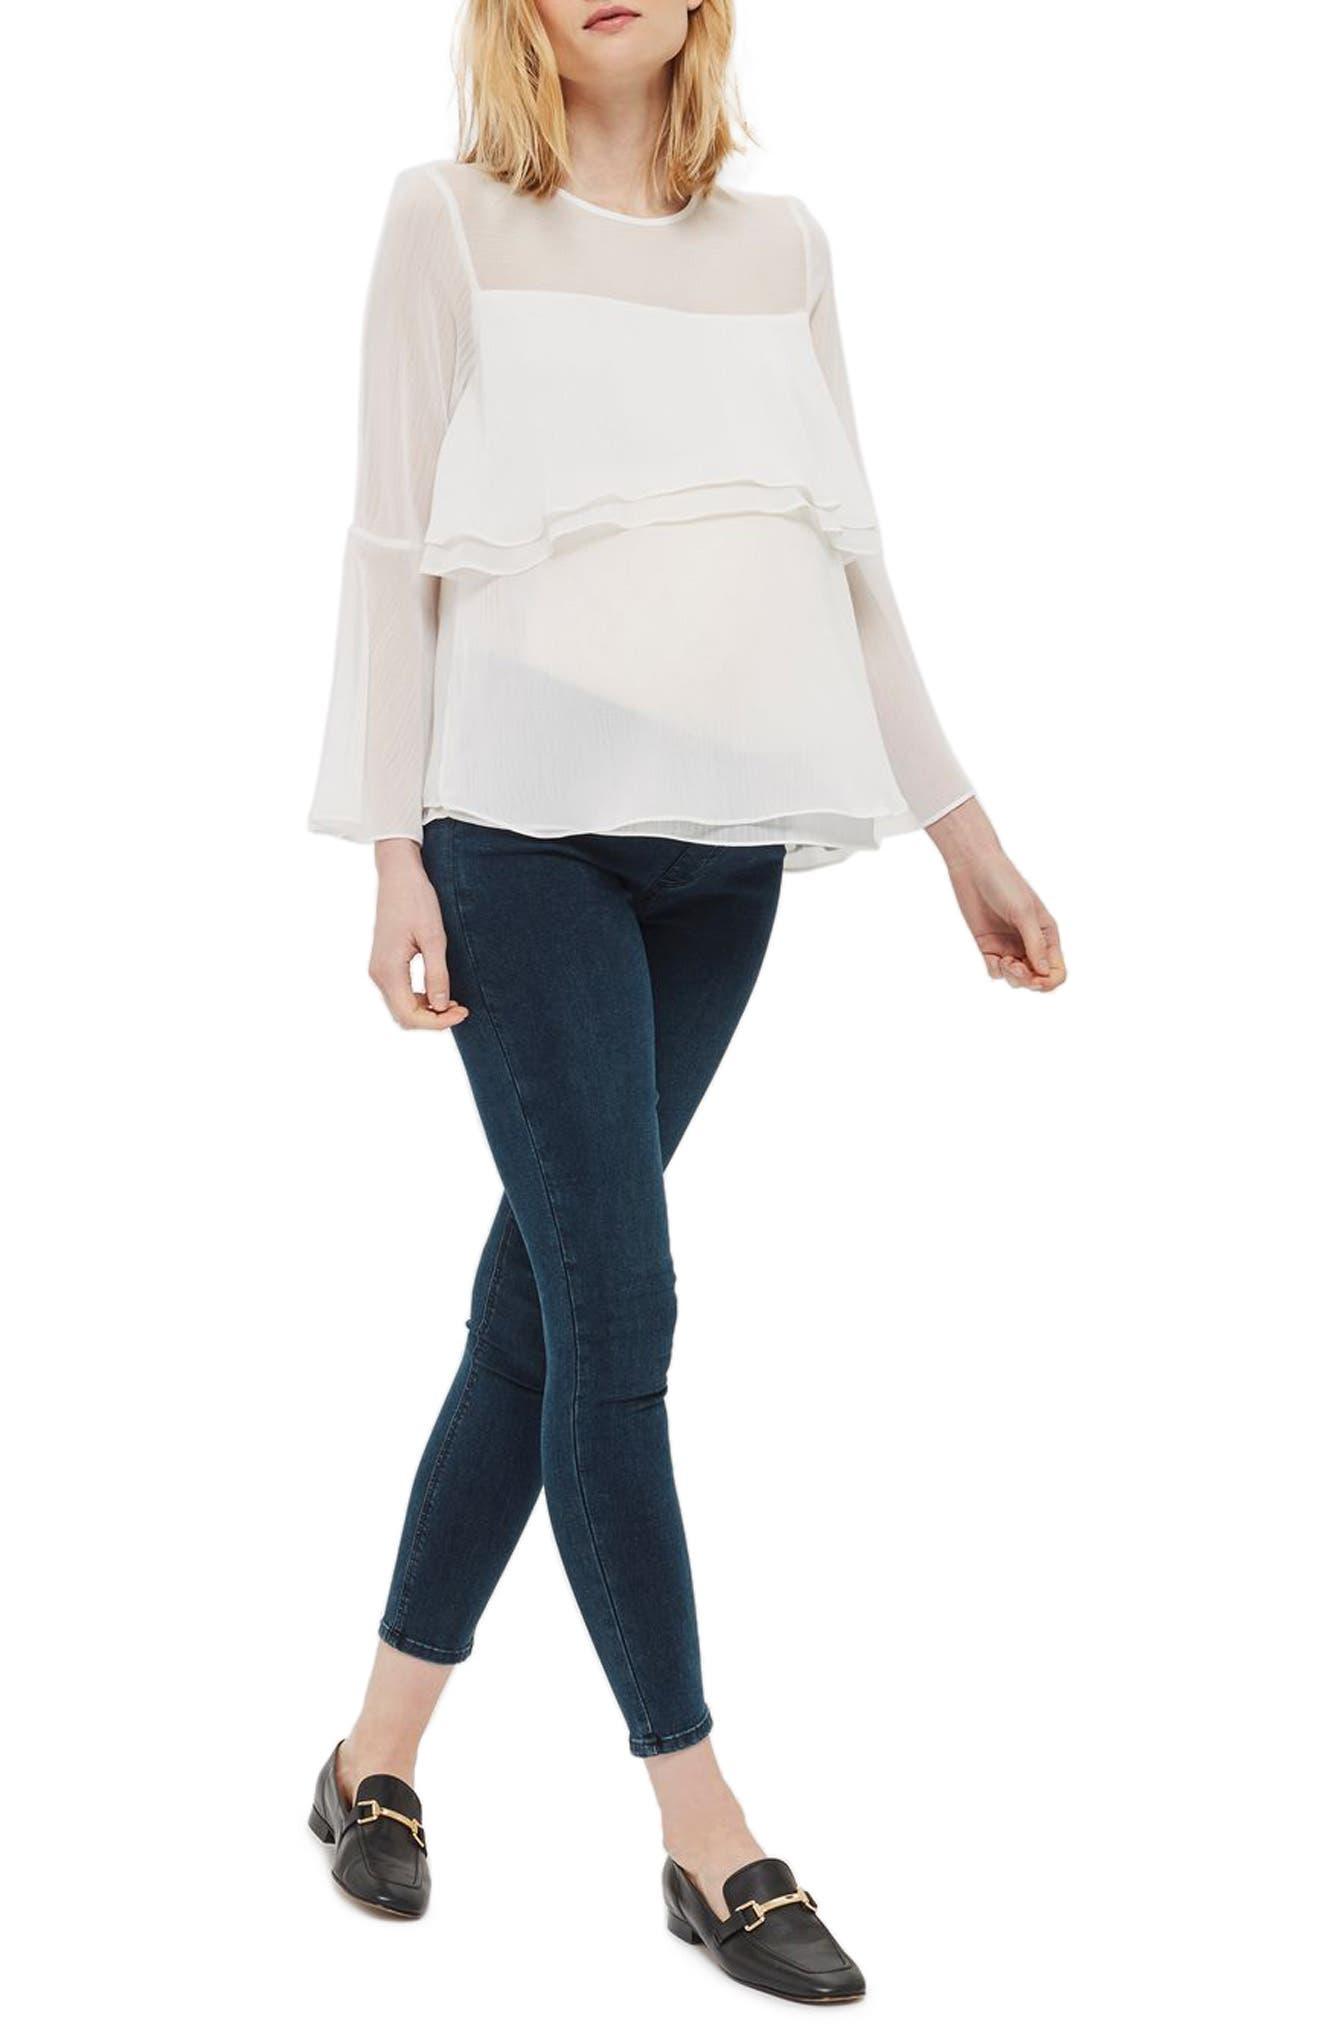 Topshop Joni Skinny Maternity Jeans